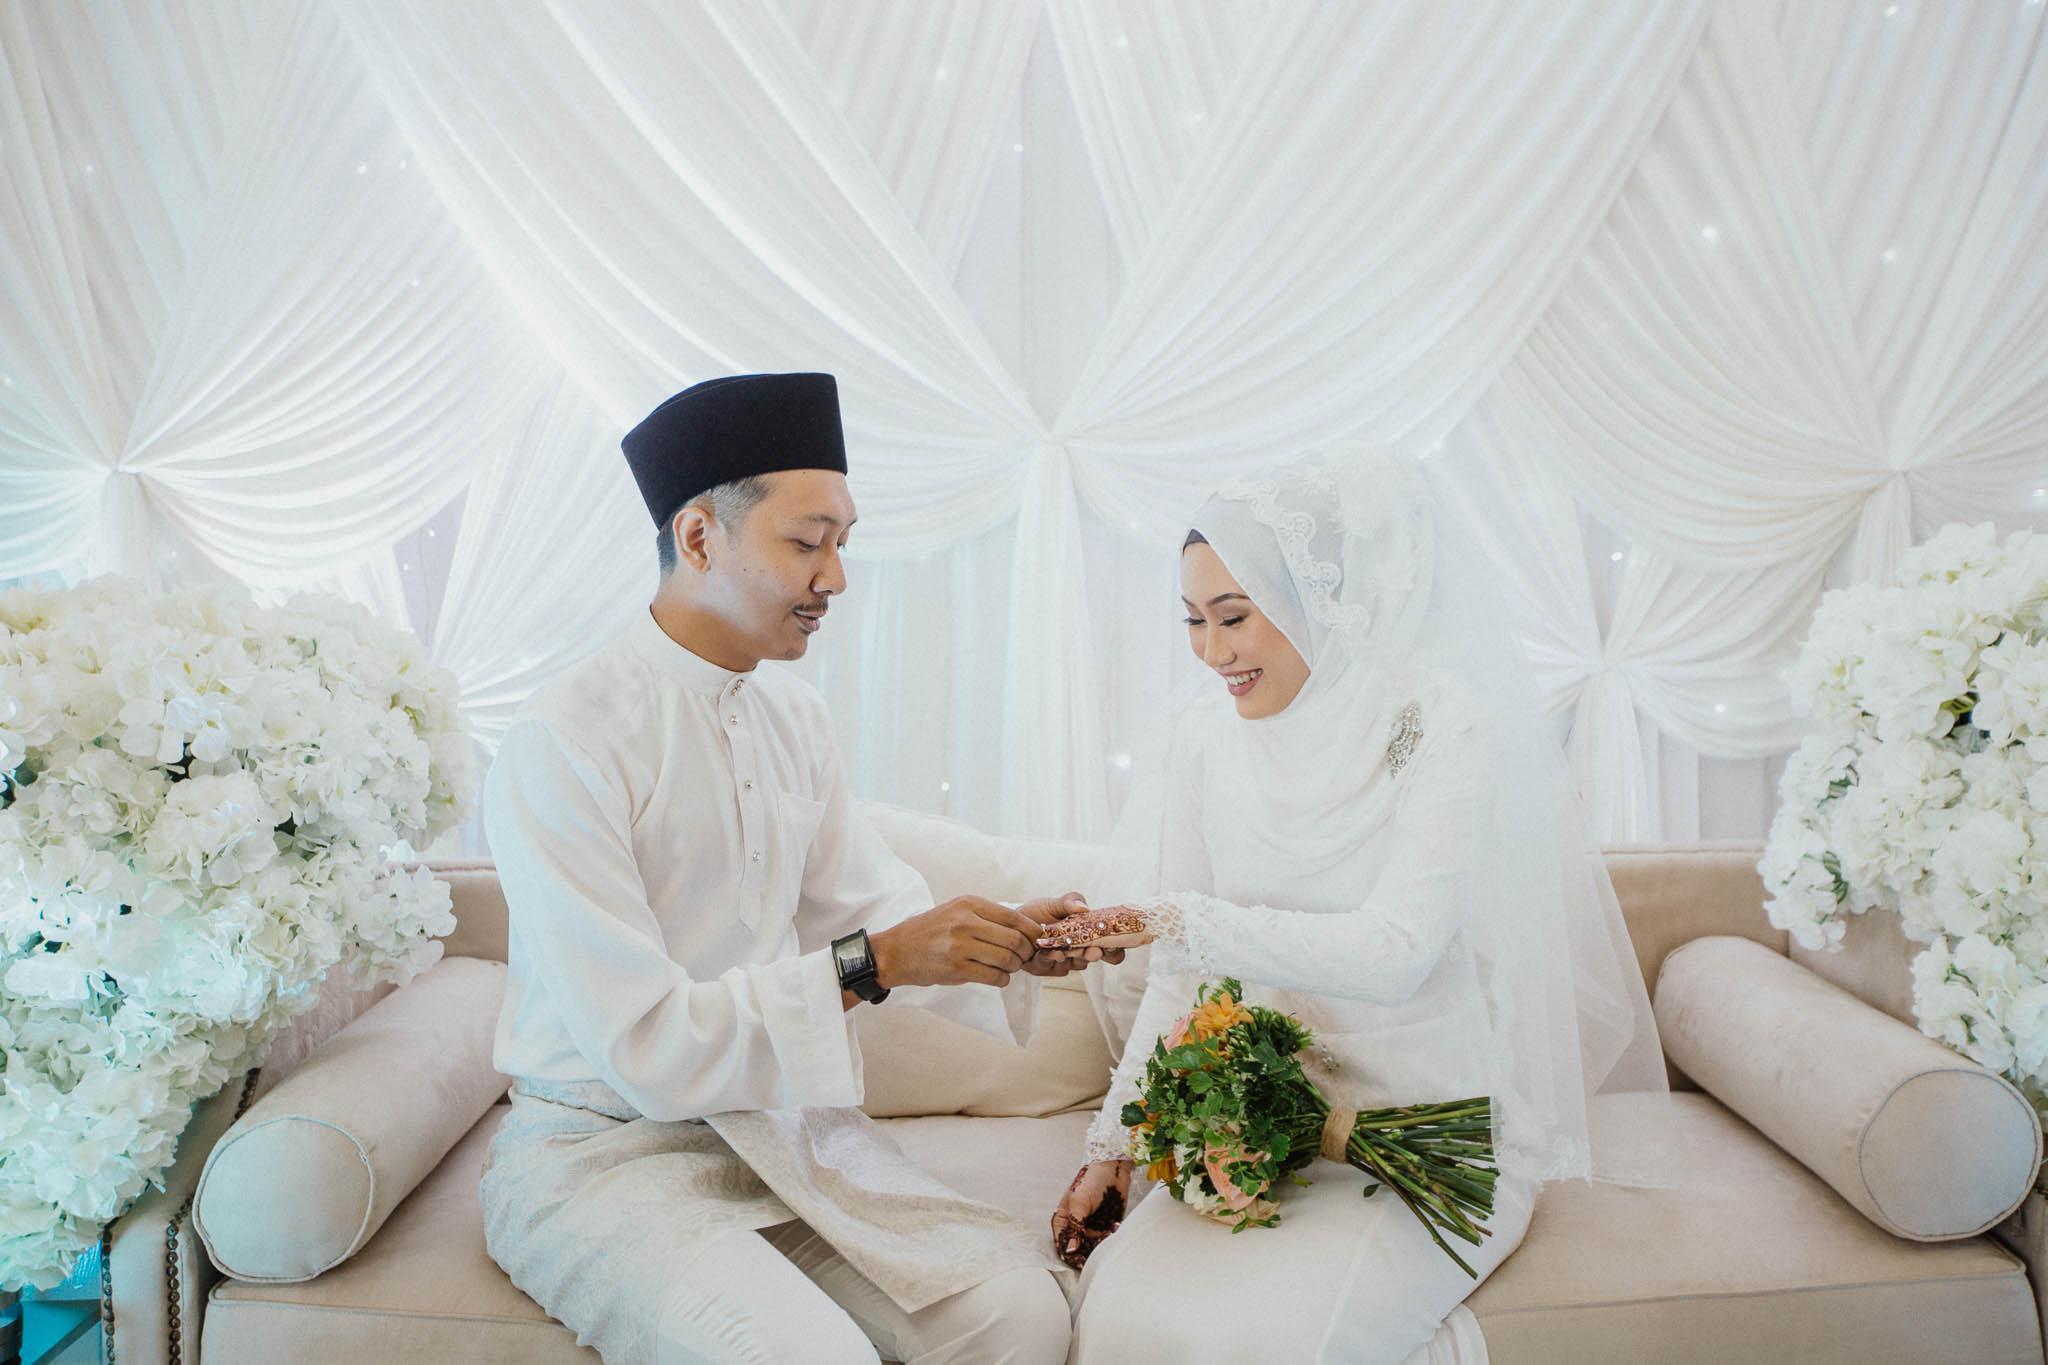 singapore-wedding-photographer-wedding-nufail-addafiq-026.jpg